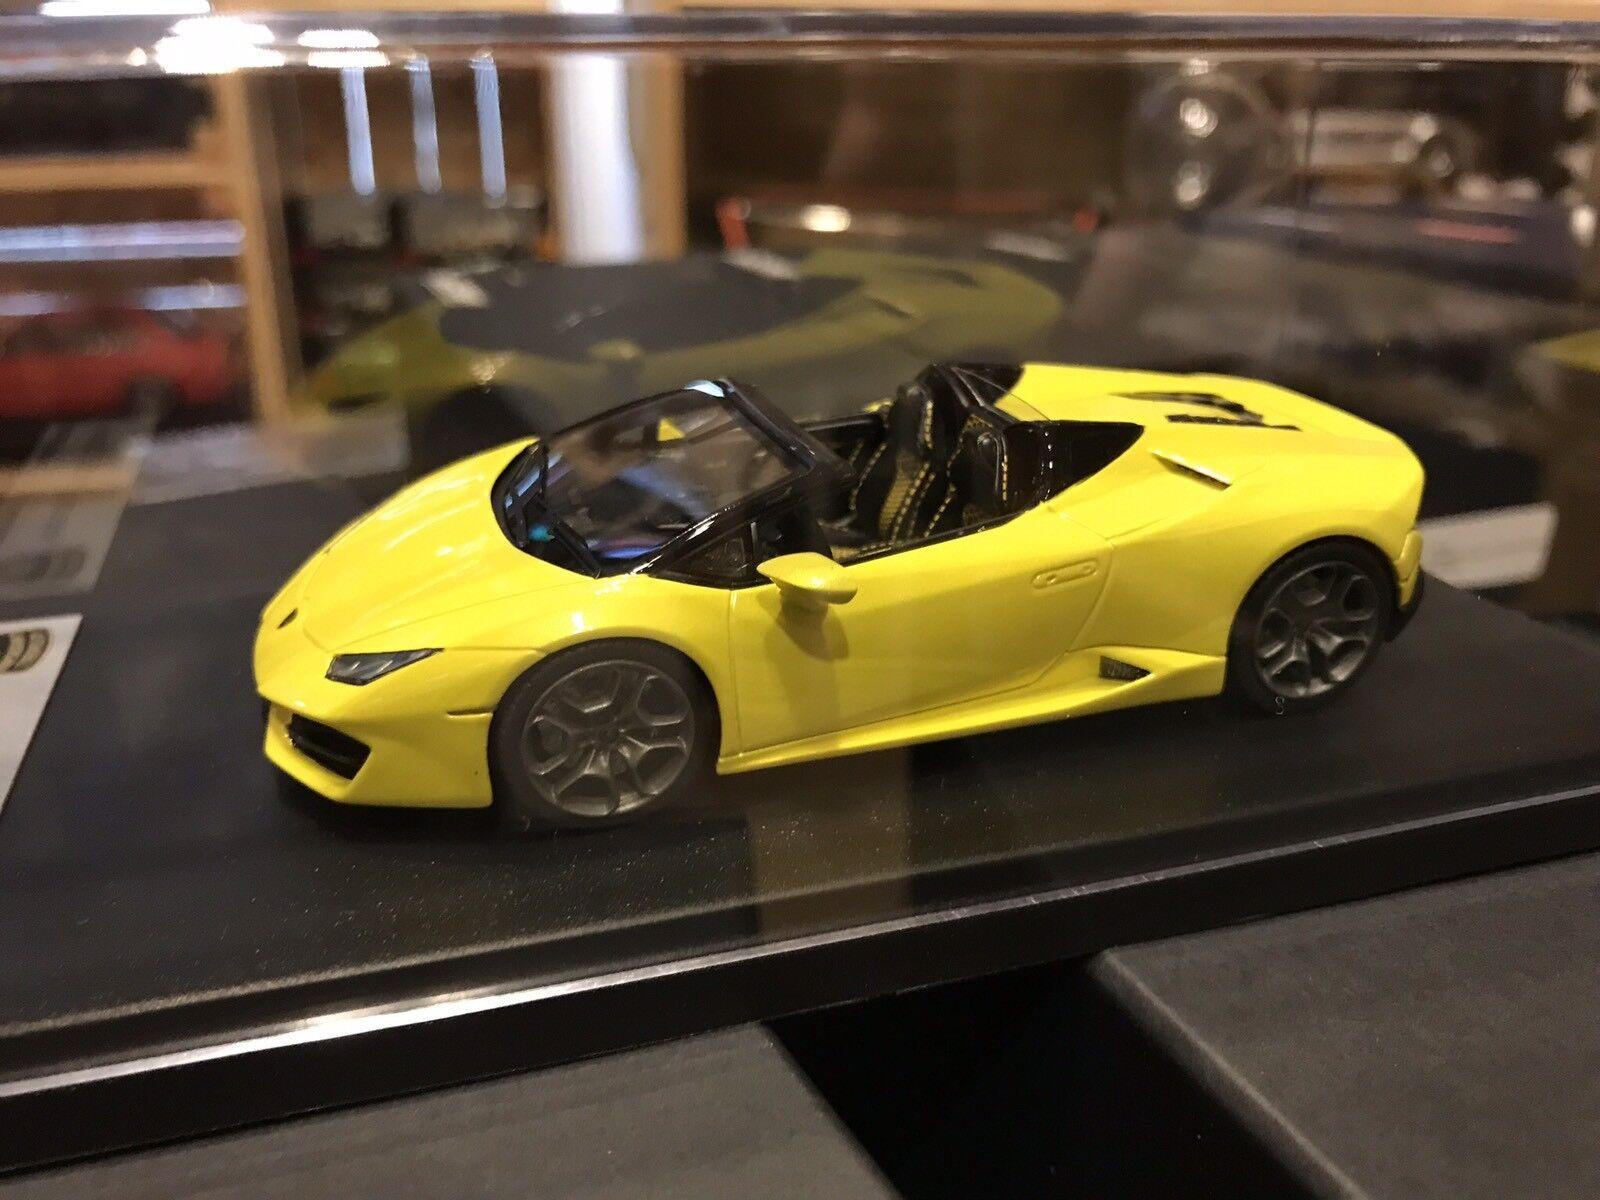 Lamborghini brochure LP 580-2 Spyder-amarillo tenerife-LookSmart - 1 43